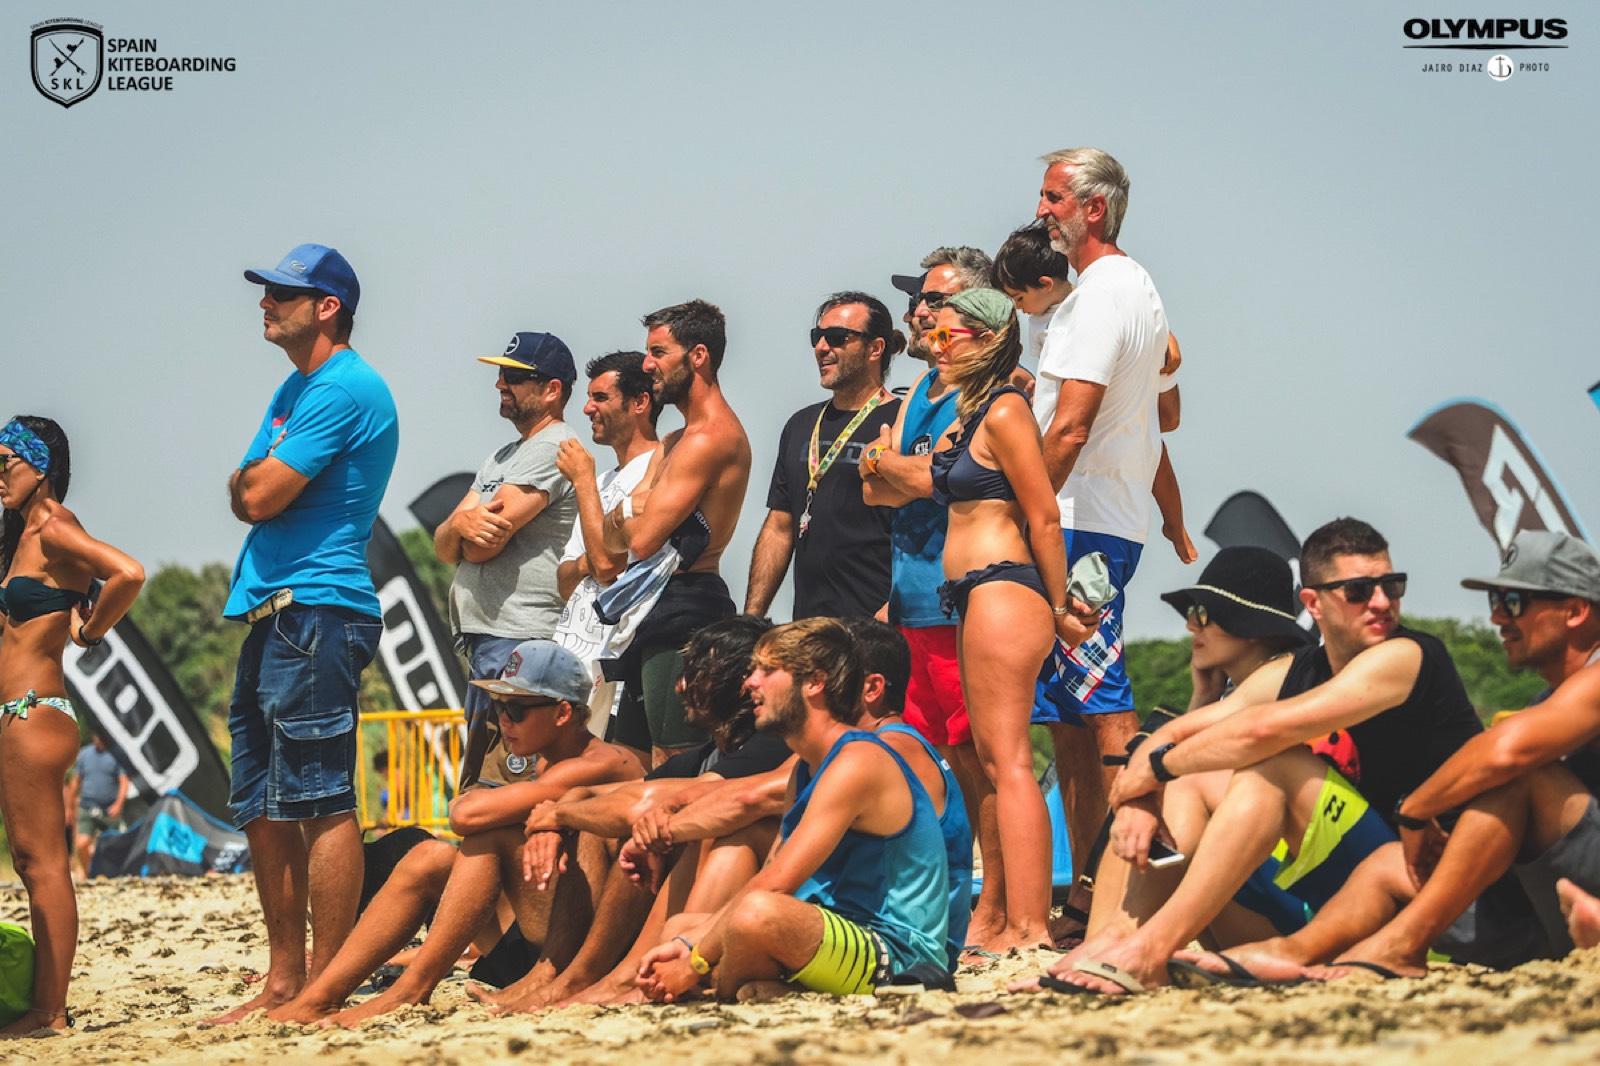 galeria-spain-kiteboarding-league-2018-38